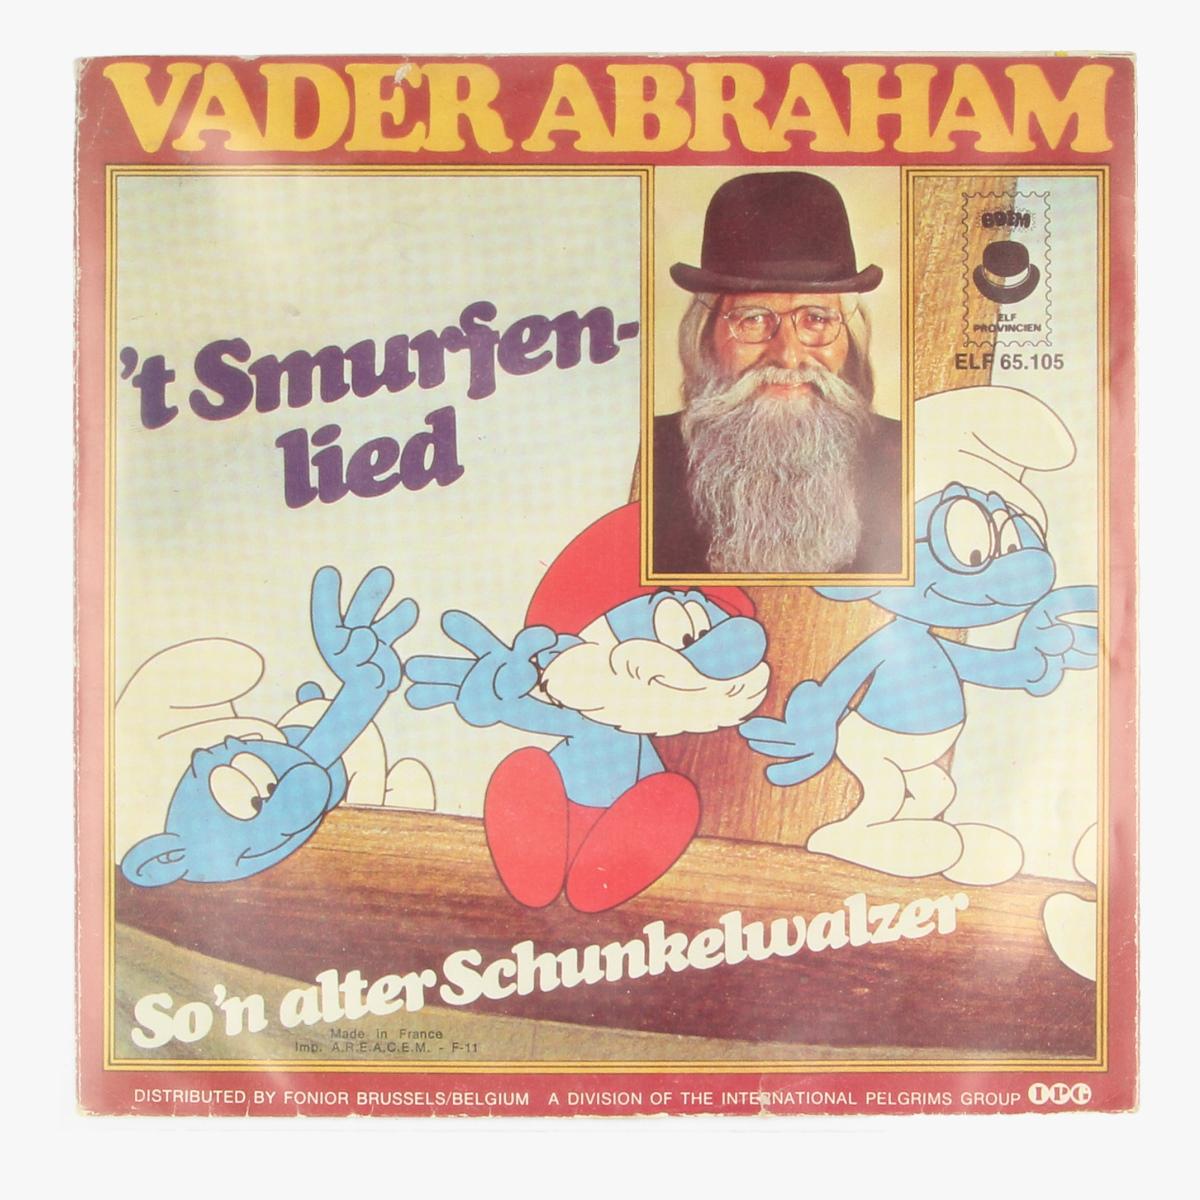 Afbeeldingen van Vader Abraham 't Smurfenlied. So'n alter Schunkelwalzer